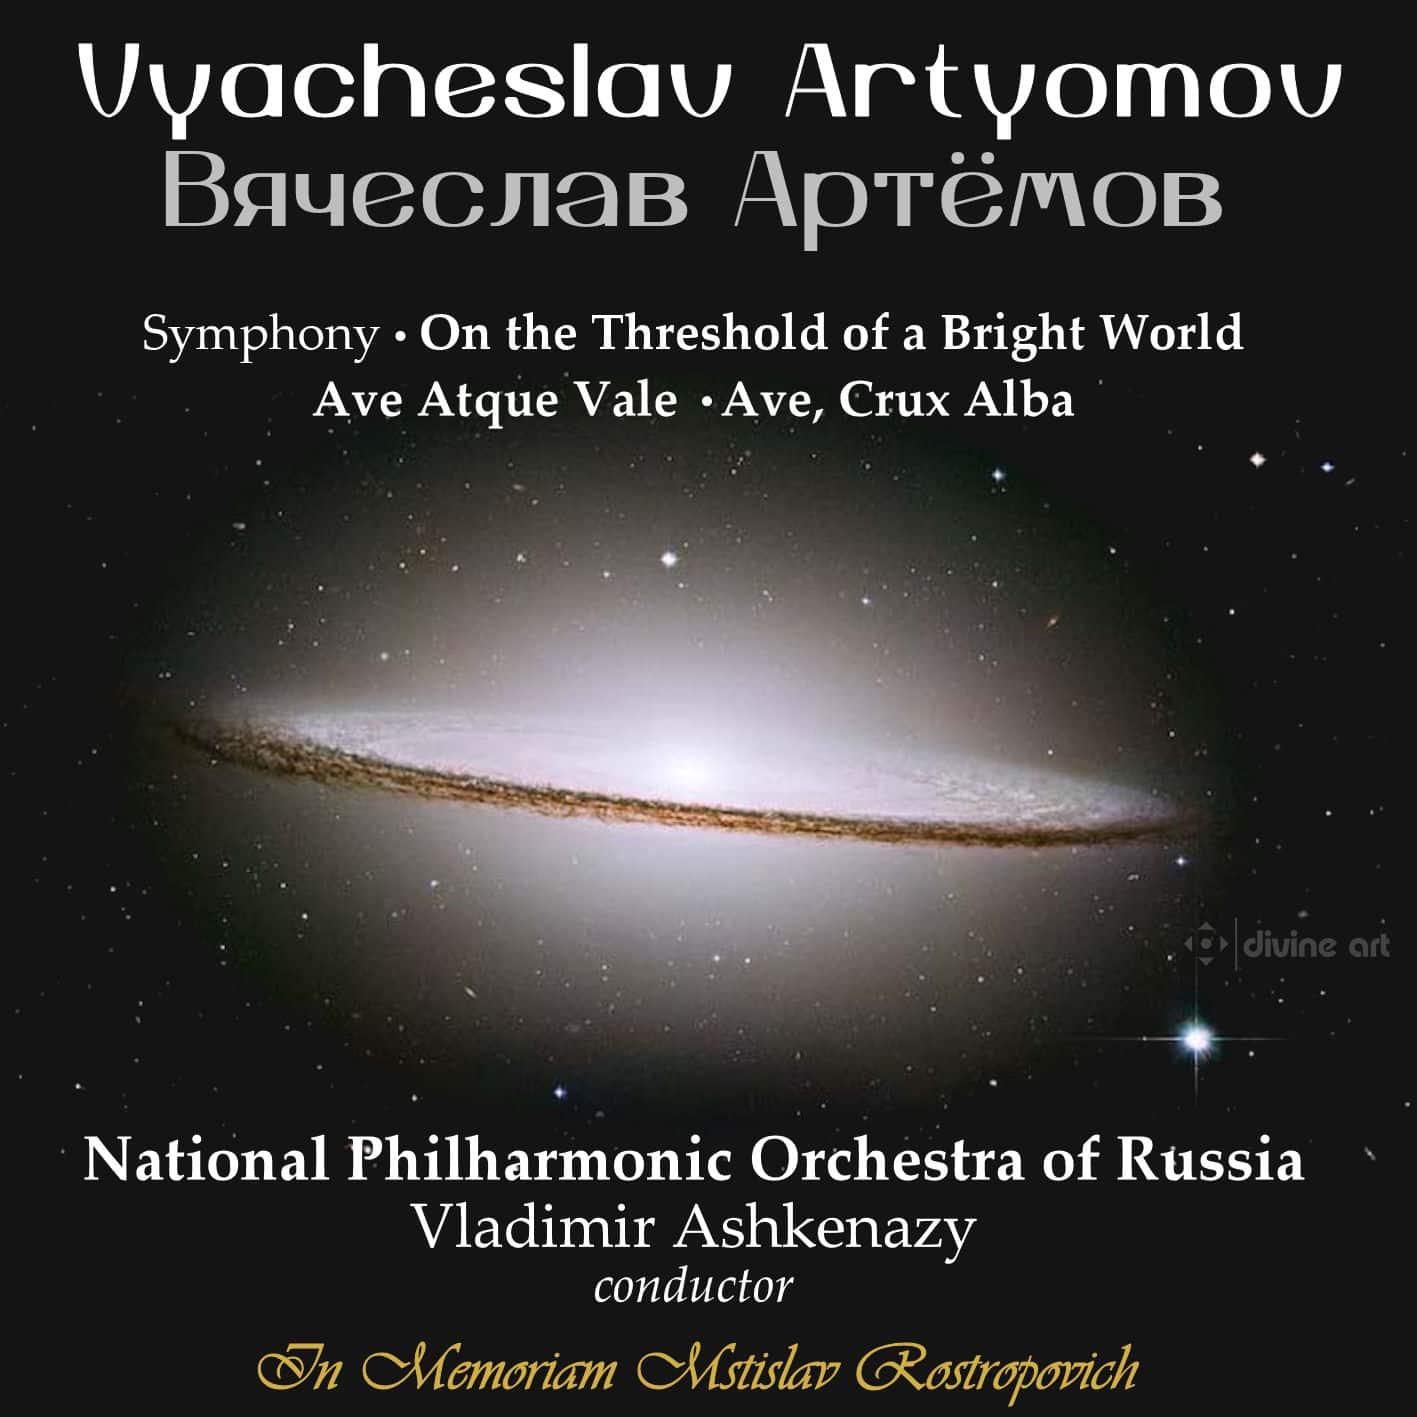 Artyomov: On the Threshold of a Bright World